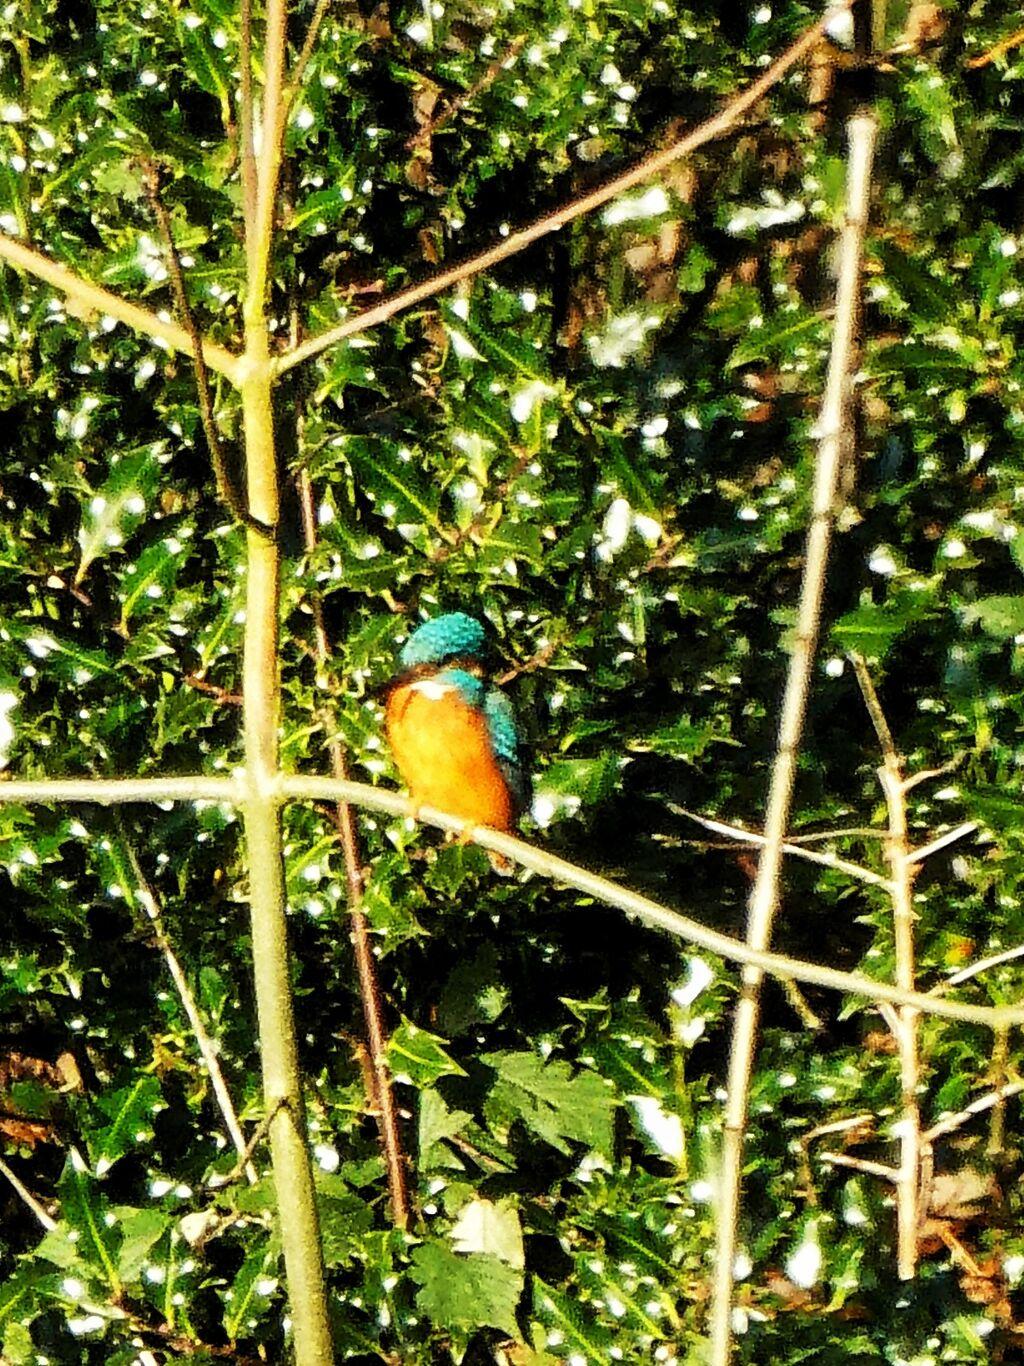 Kingfisher No. 11 @ Farnborough